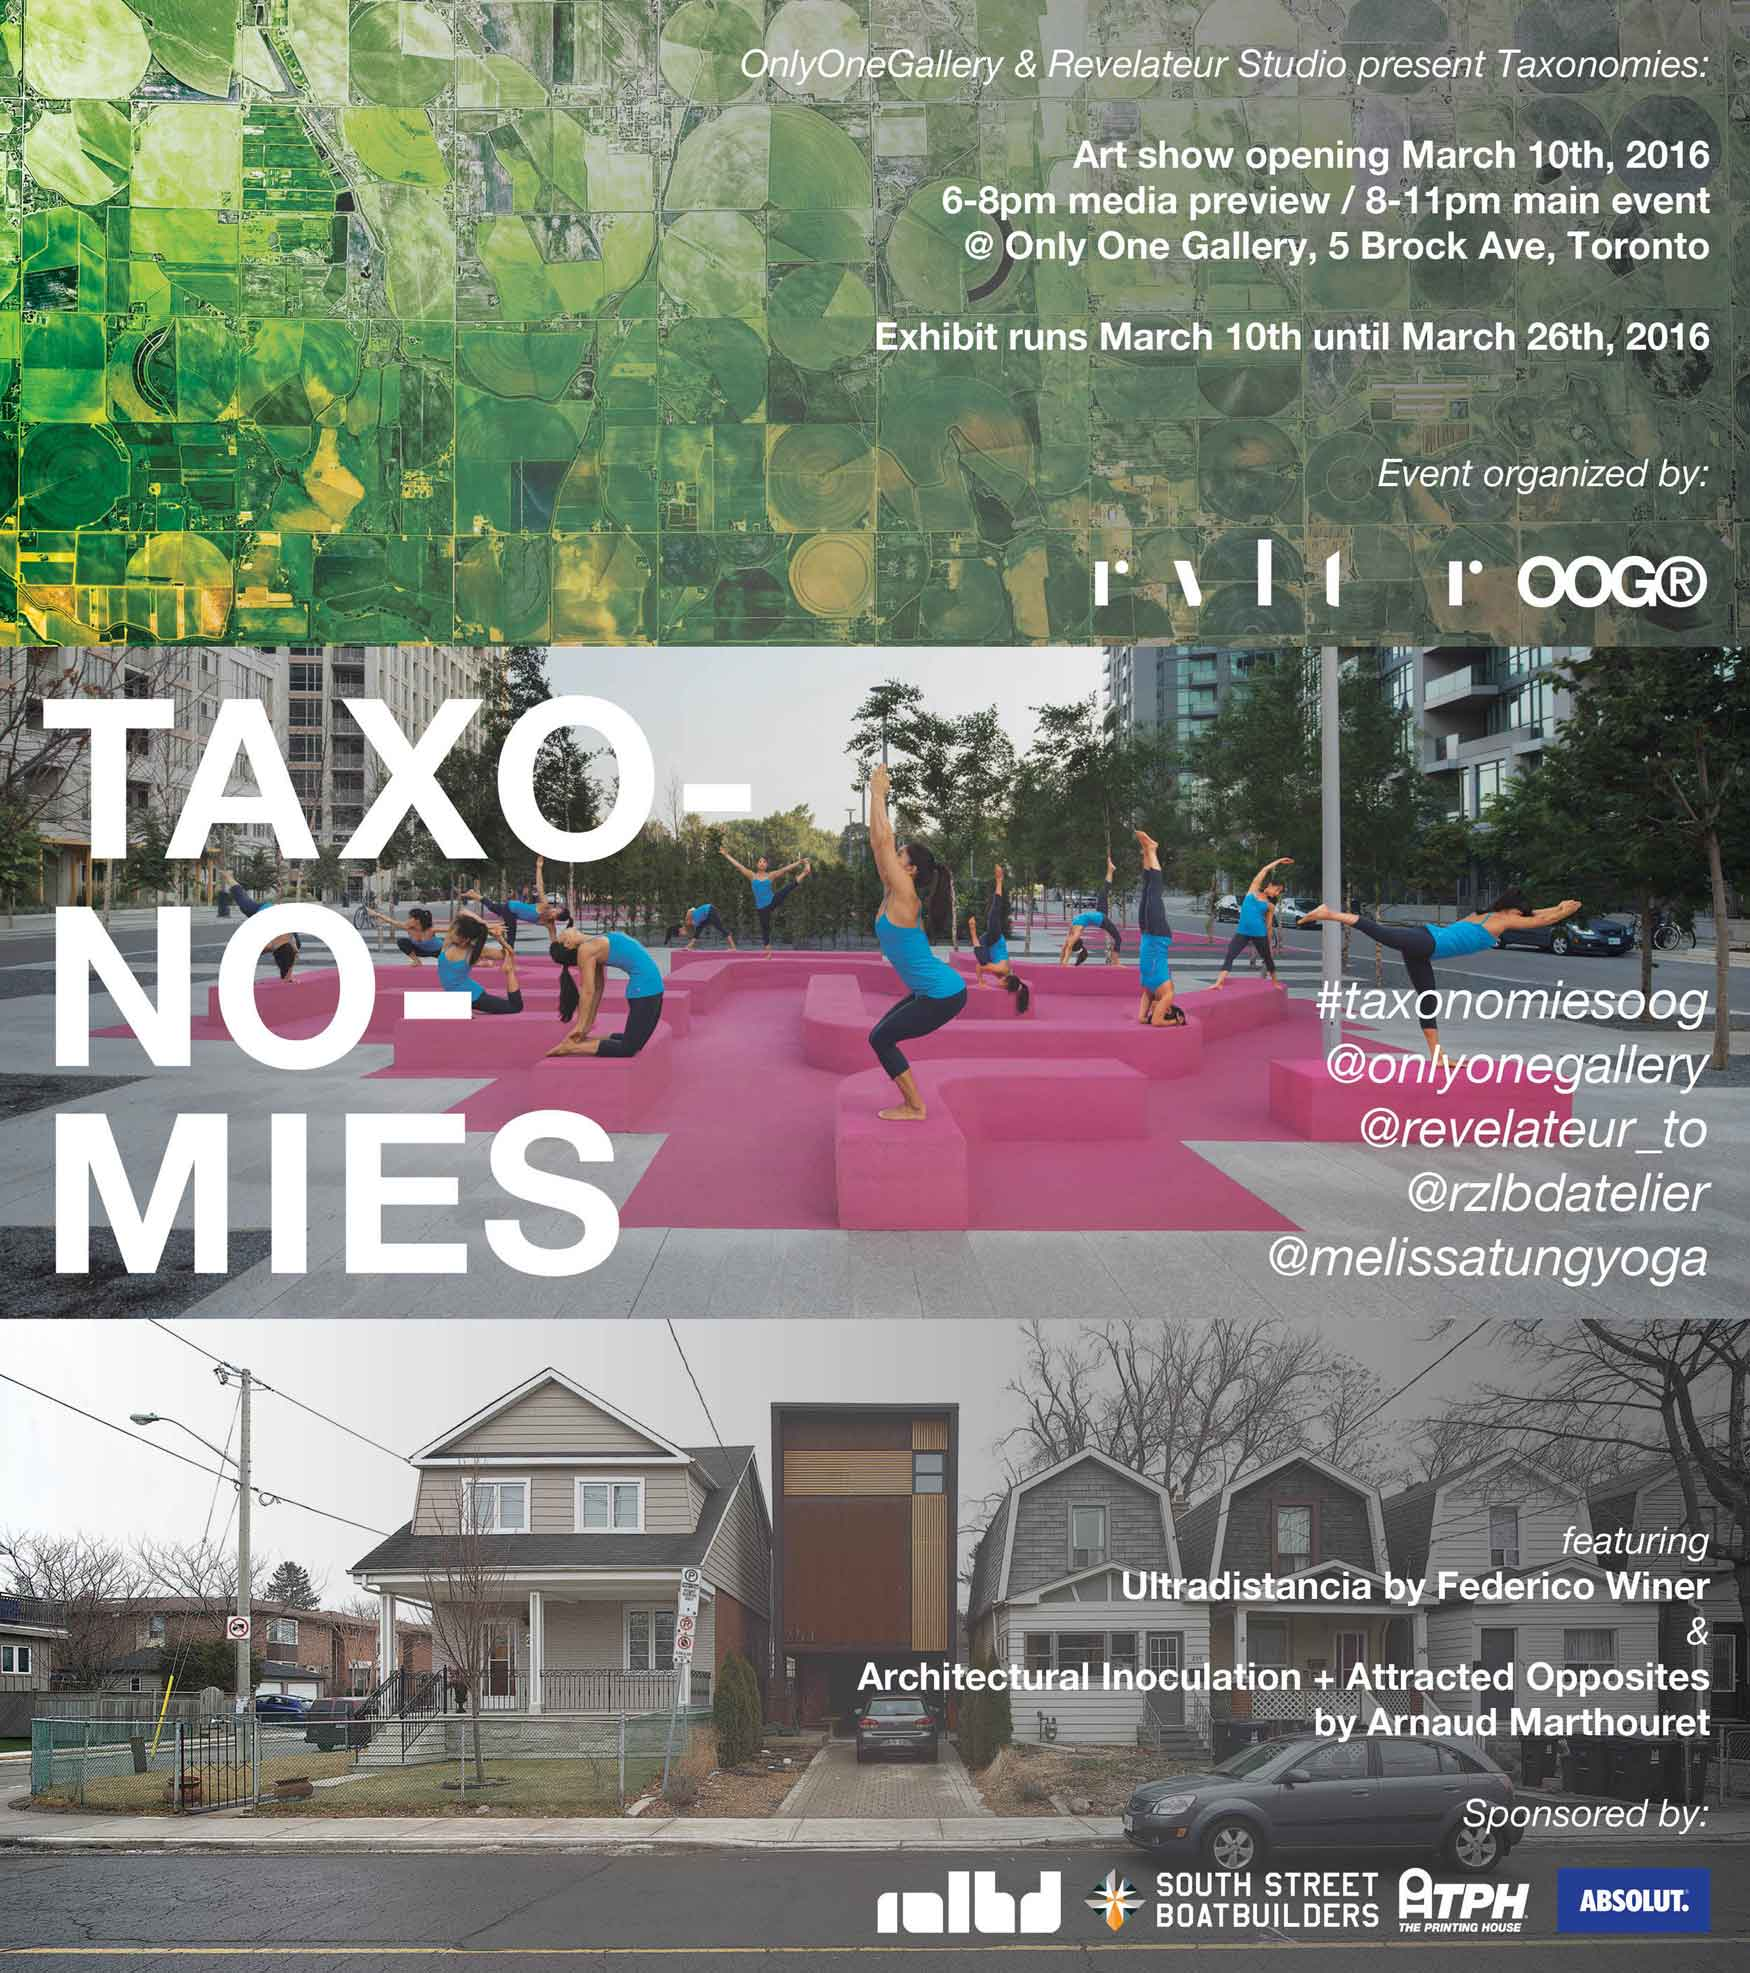 TAXONOMIES/ULTRADISTANCIA. Toronto Exhibition